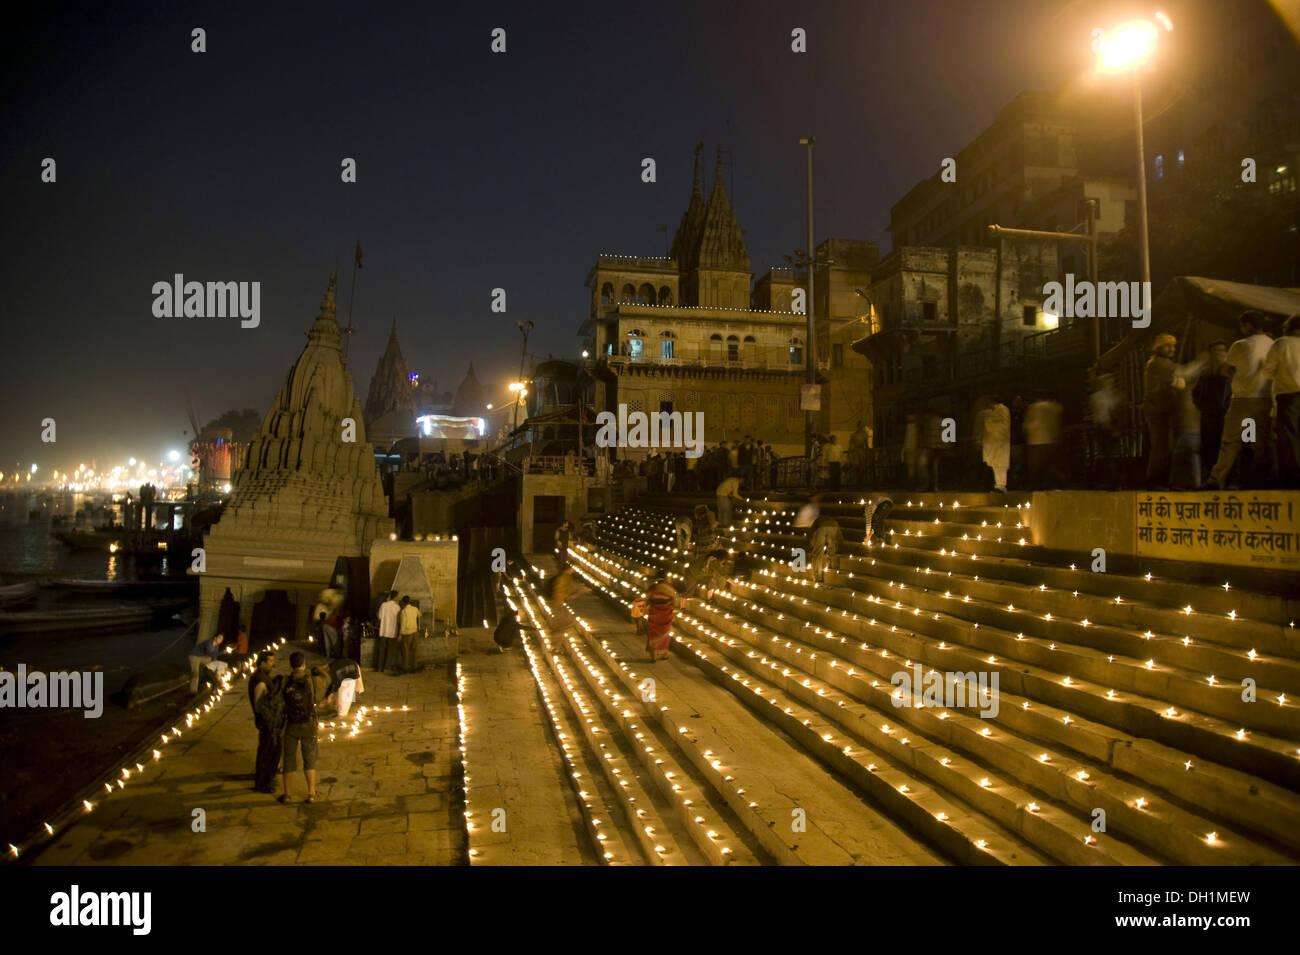 Night lamps india - Stock Photo Oil Lamps Diyas Diwali Festival Kashi Karvat Temple Scindia Ghat Varanasi Uttar Pradesh India